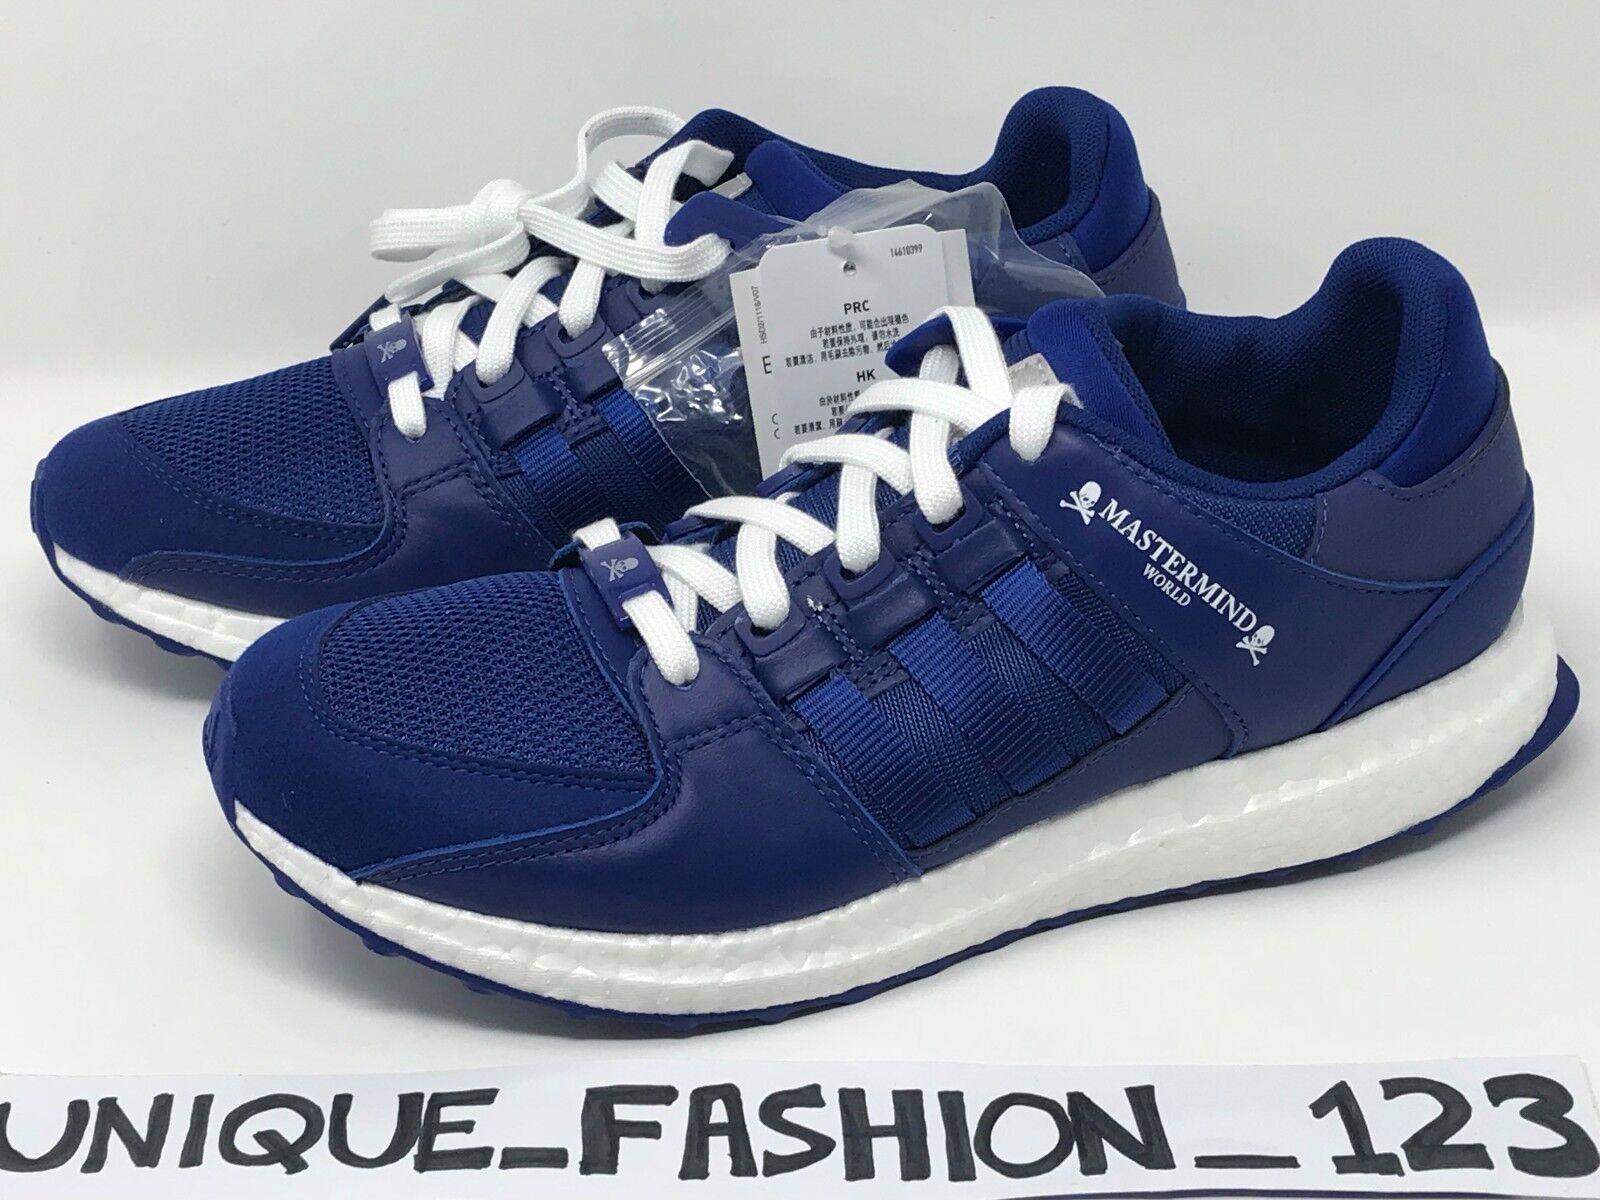 Brand New Adidas Adidas Adidas Yeezy Boost 700 Wave Runner Taille9 da0493